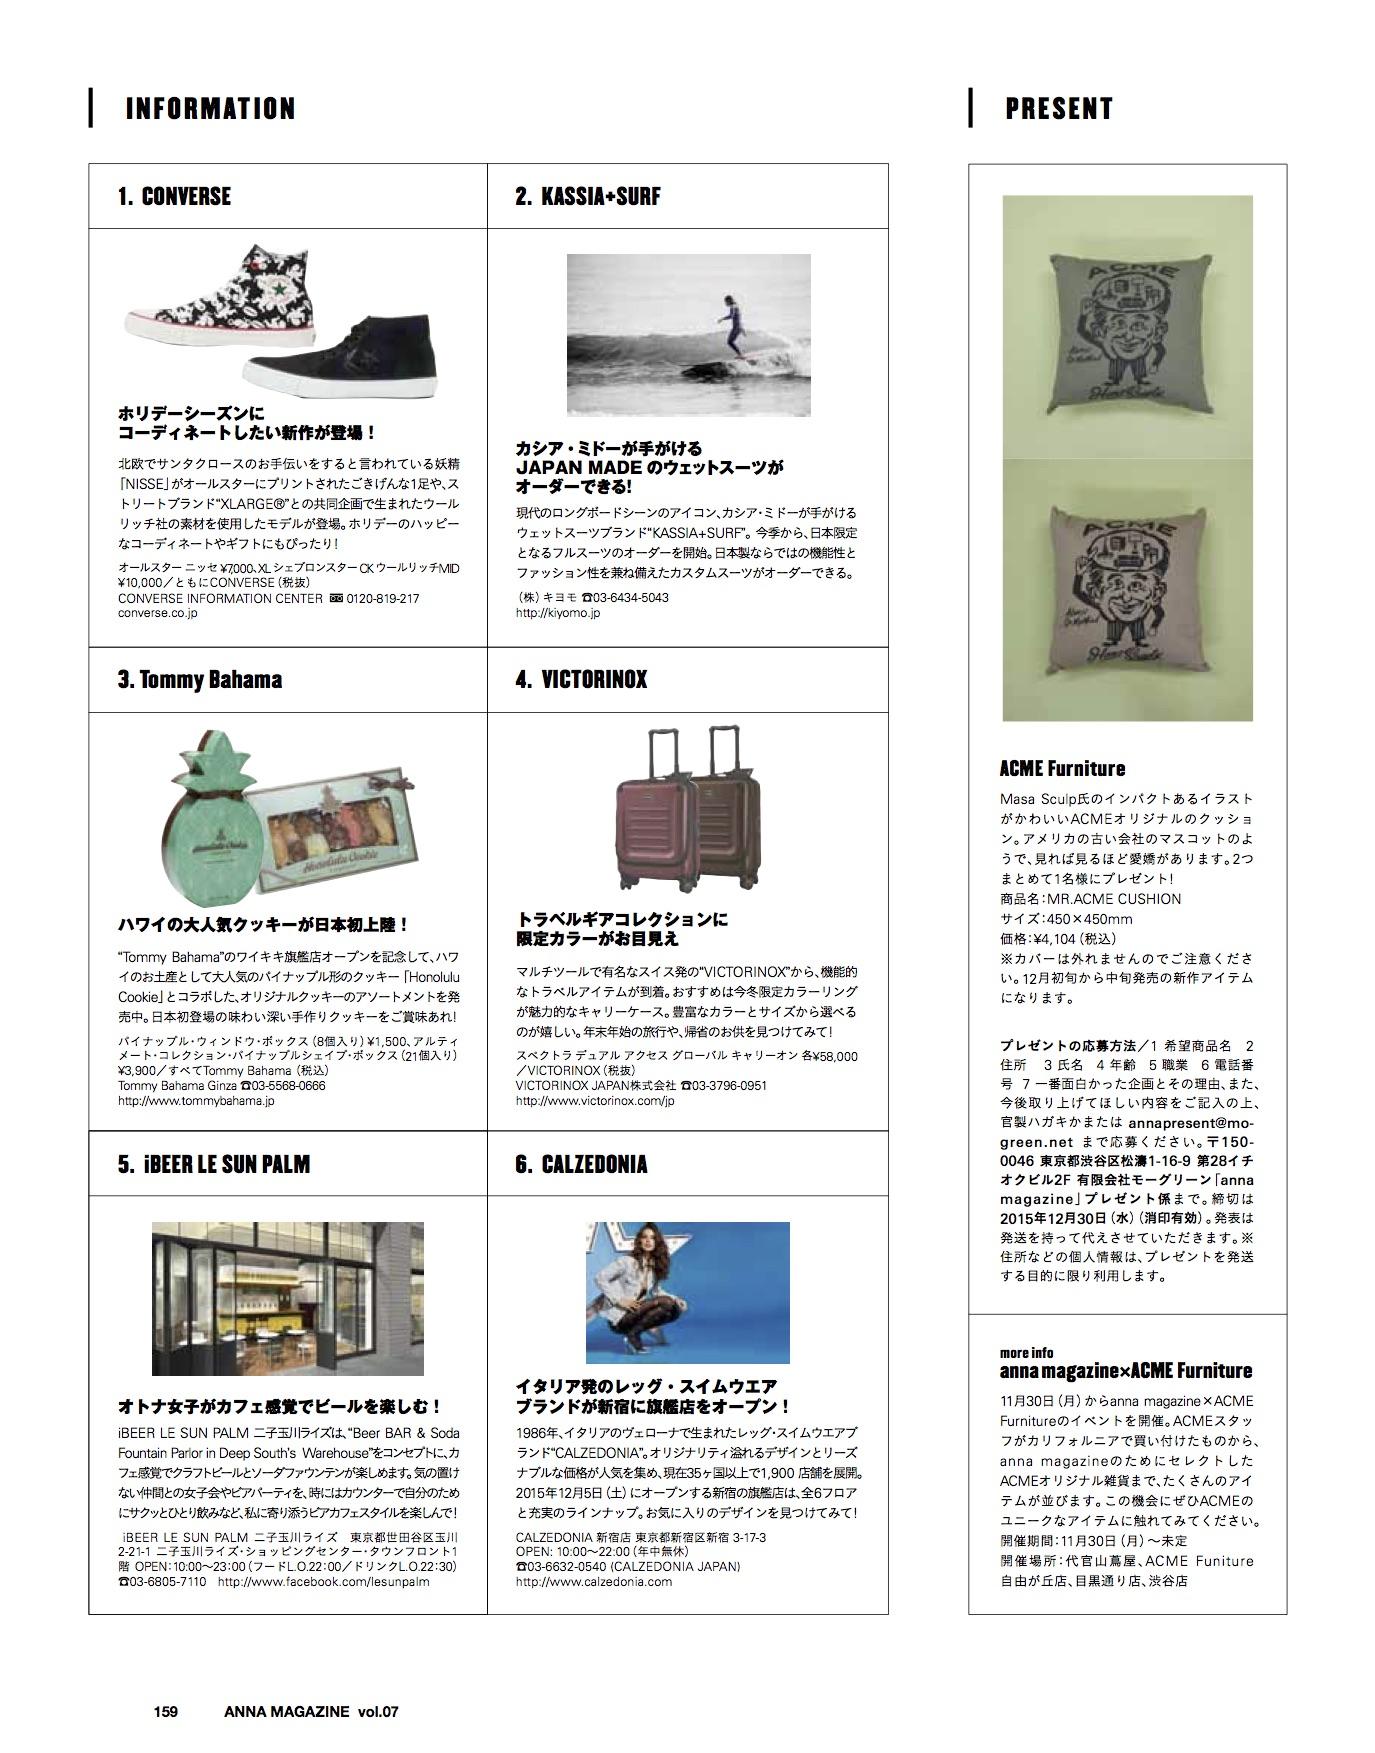 anna magazine vol.7 P45